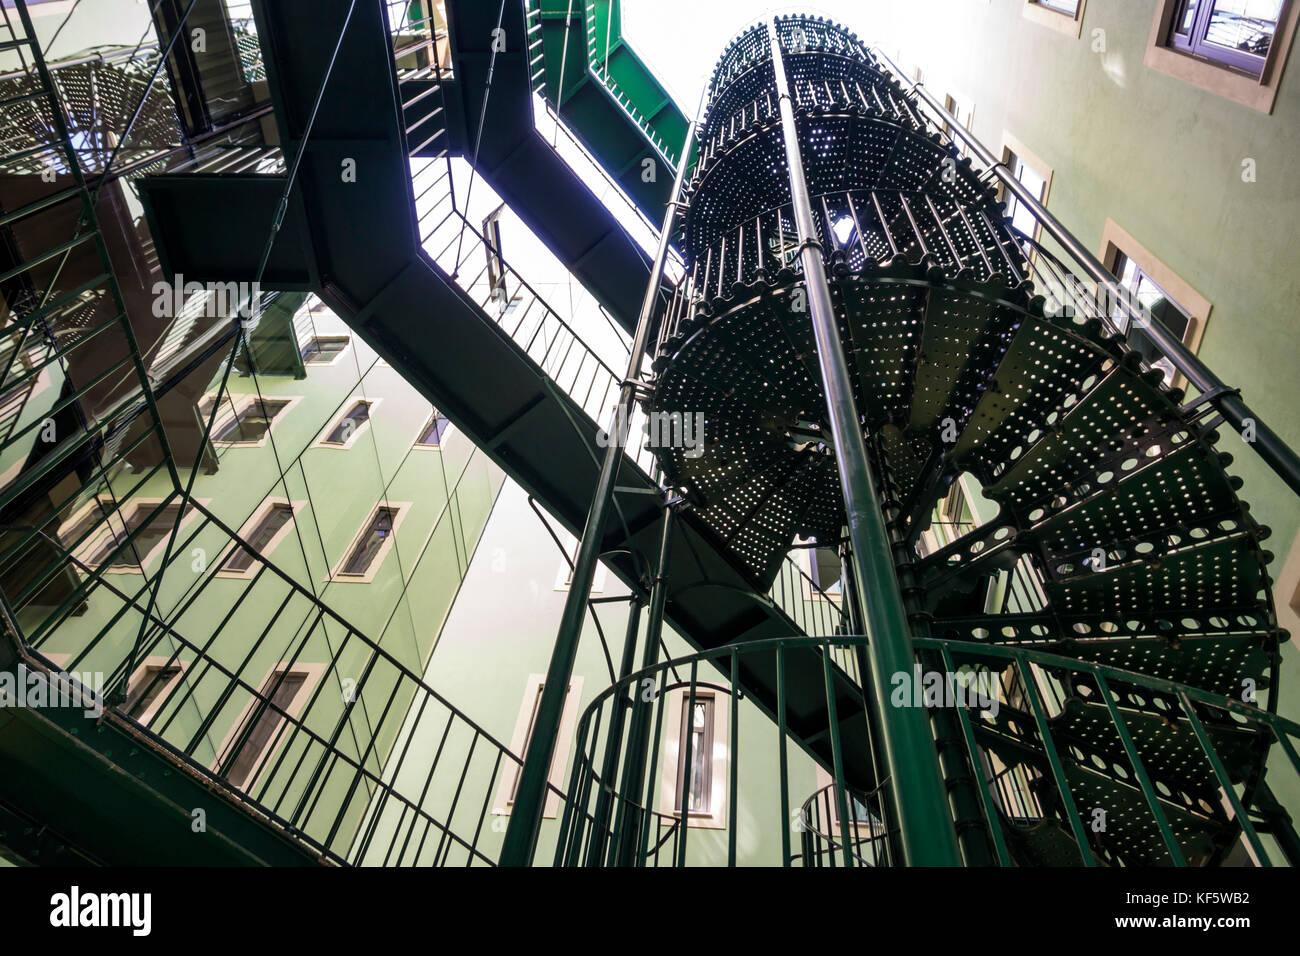 Lisbon Portugal Rua Alexandre Herculano Holiday Inn Express Liberdade hotel internal courtyard spiral staircase - Stock Image